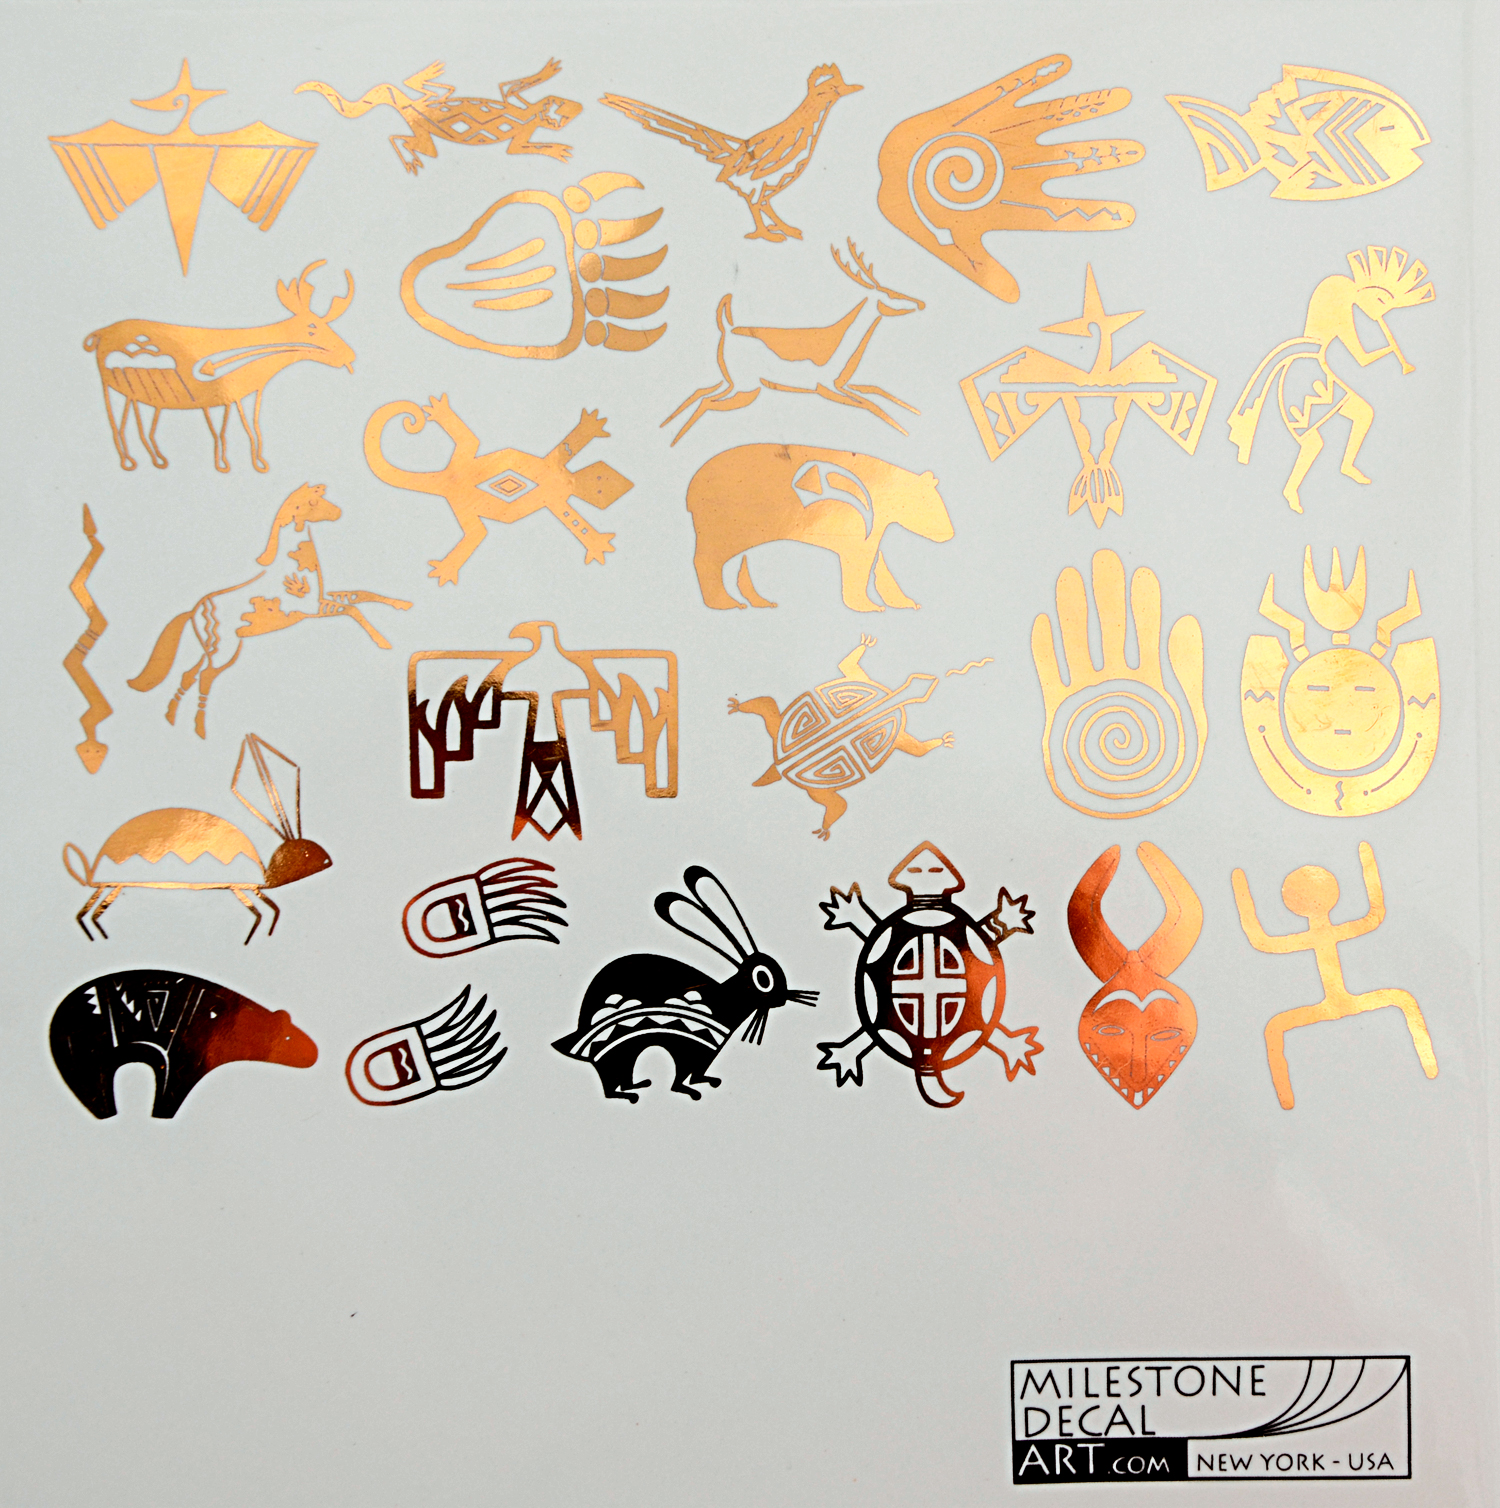 stock decals custom ceramic decals glass fusing decals il fullxfull 586778916 71vr jpg